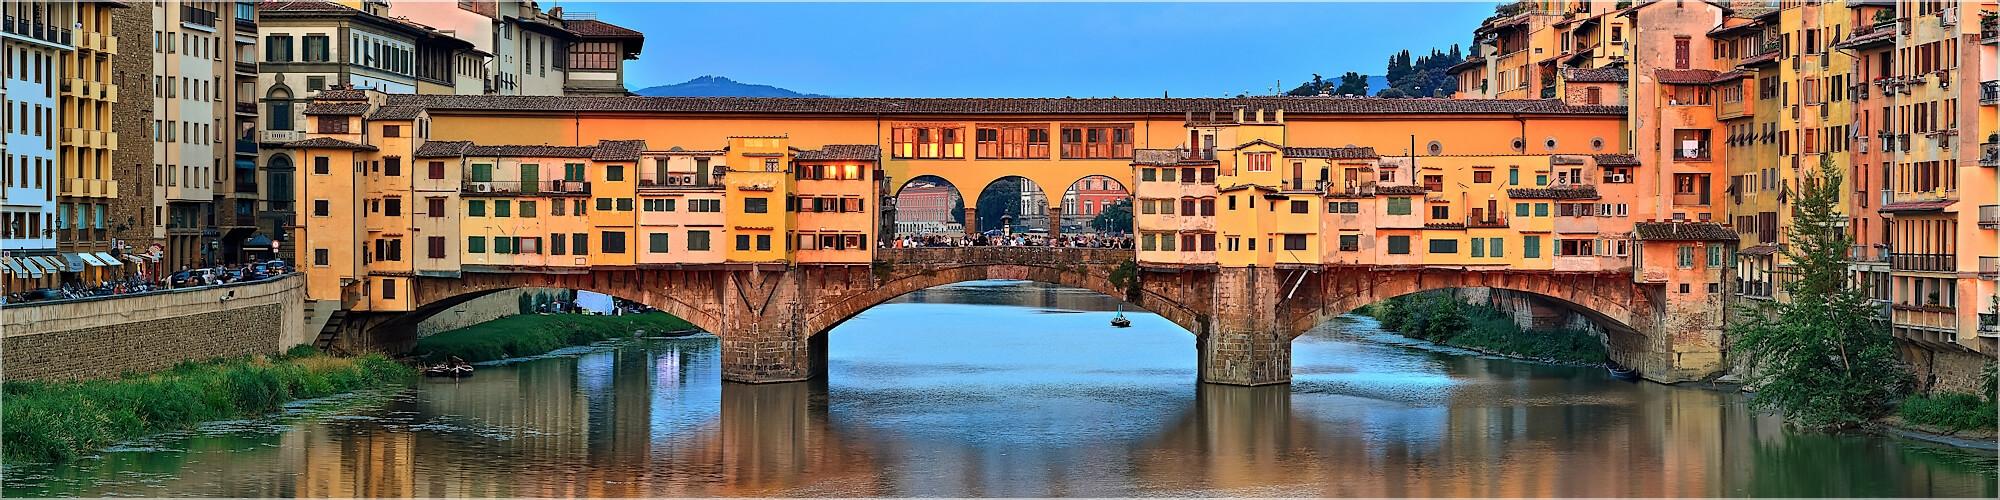 Panoramabild Florenz Ponte Vecchio Brücke